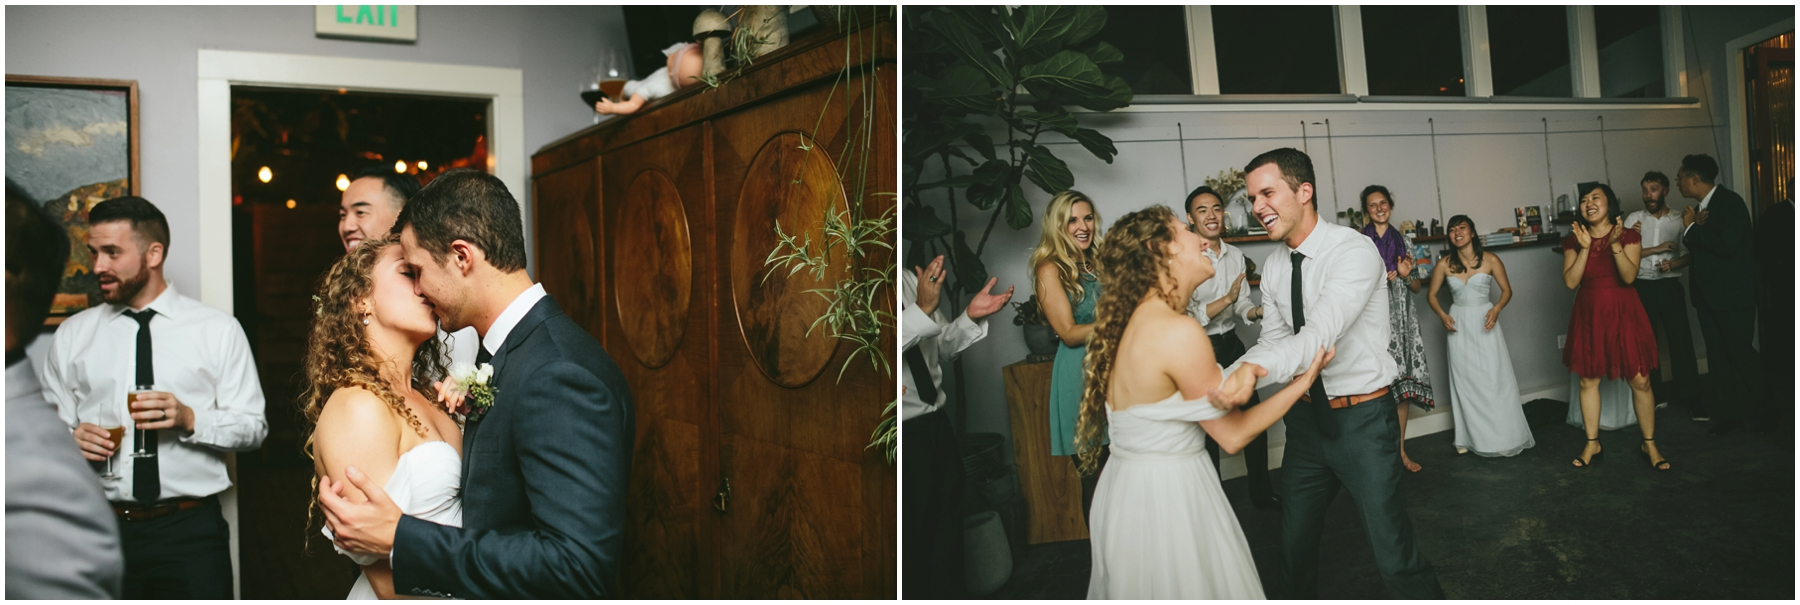 Emily+Paul-WEDDING_KellyBoitanoPhotography_0175